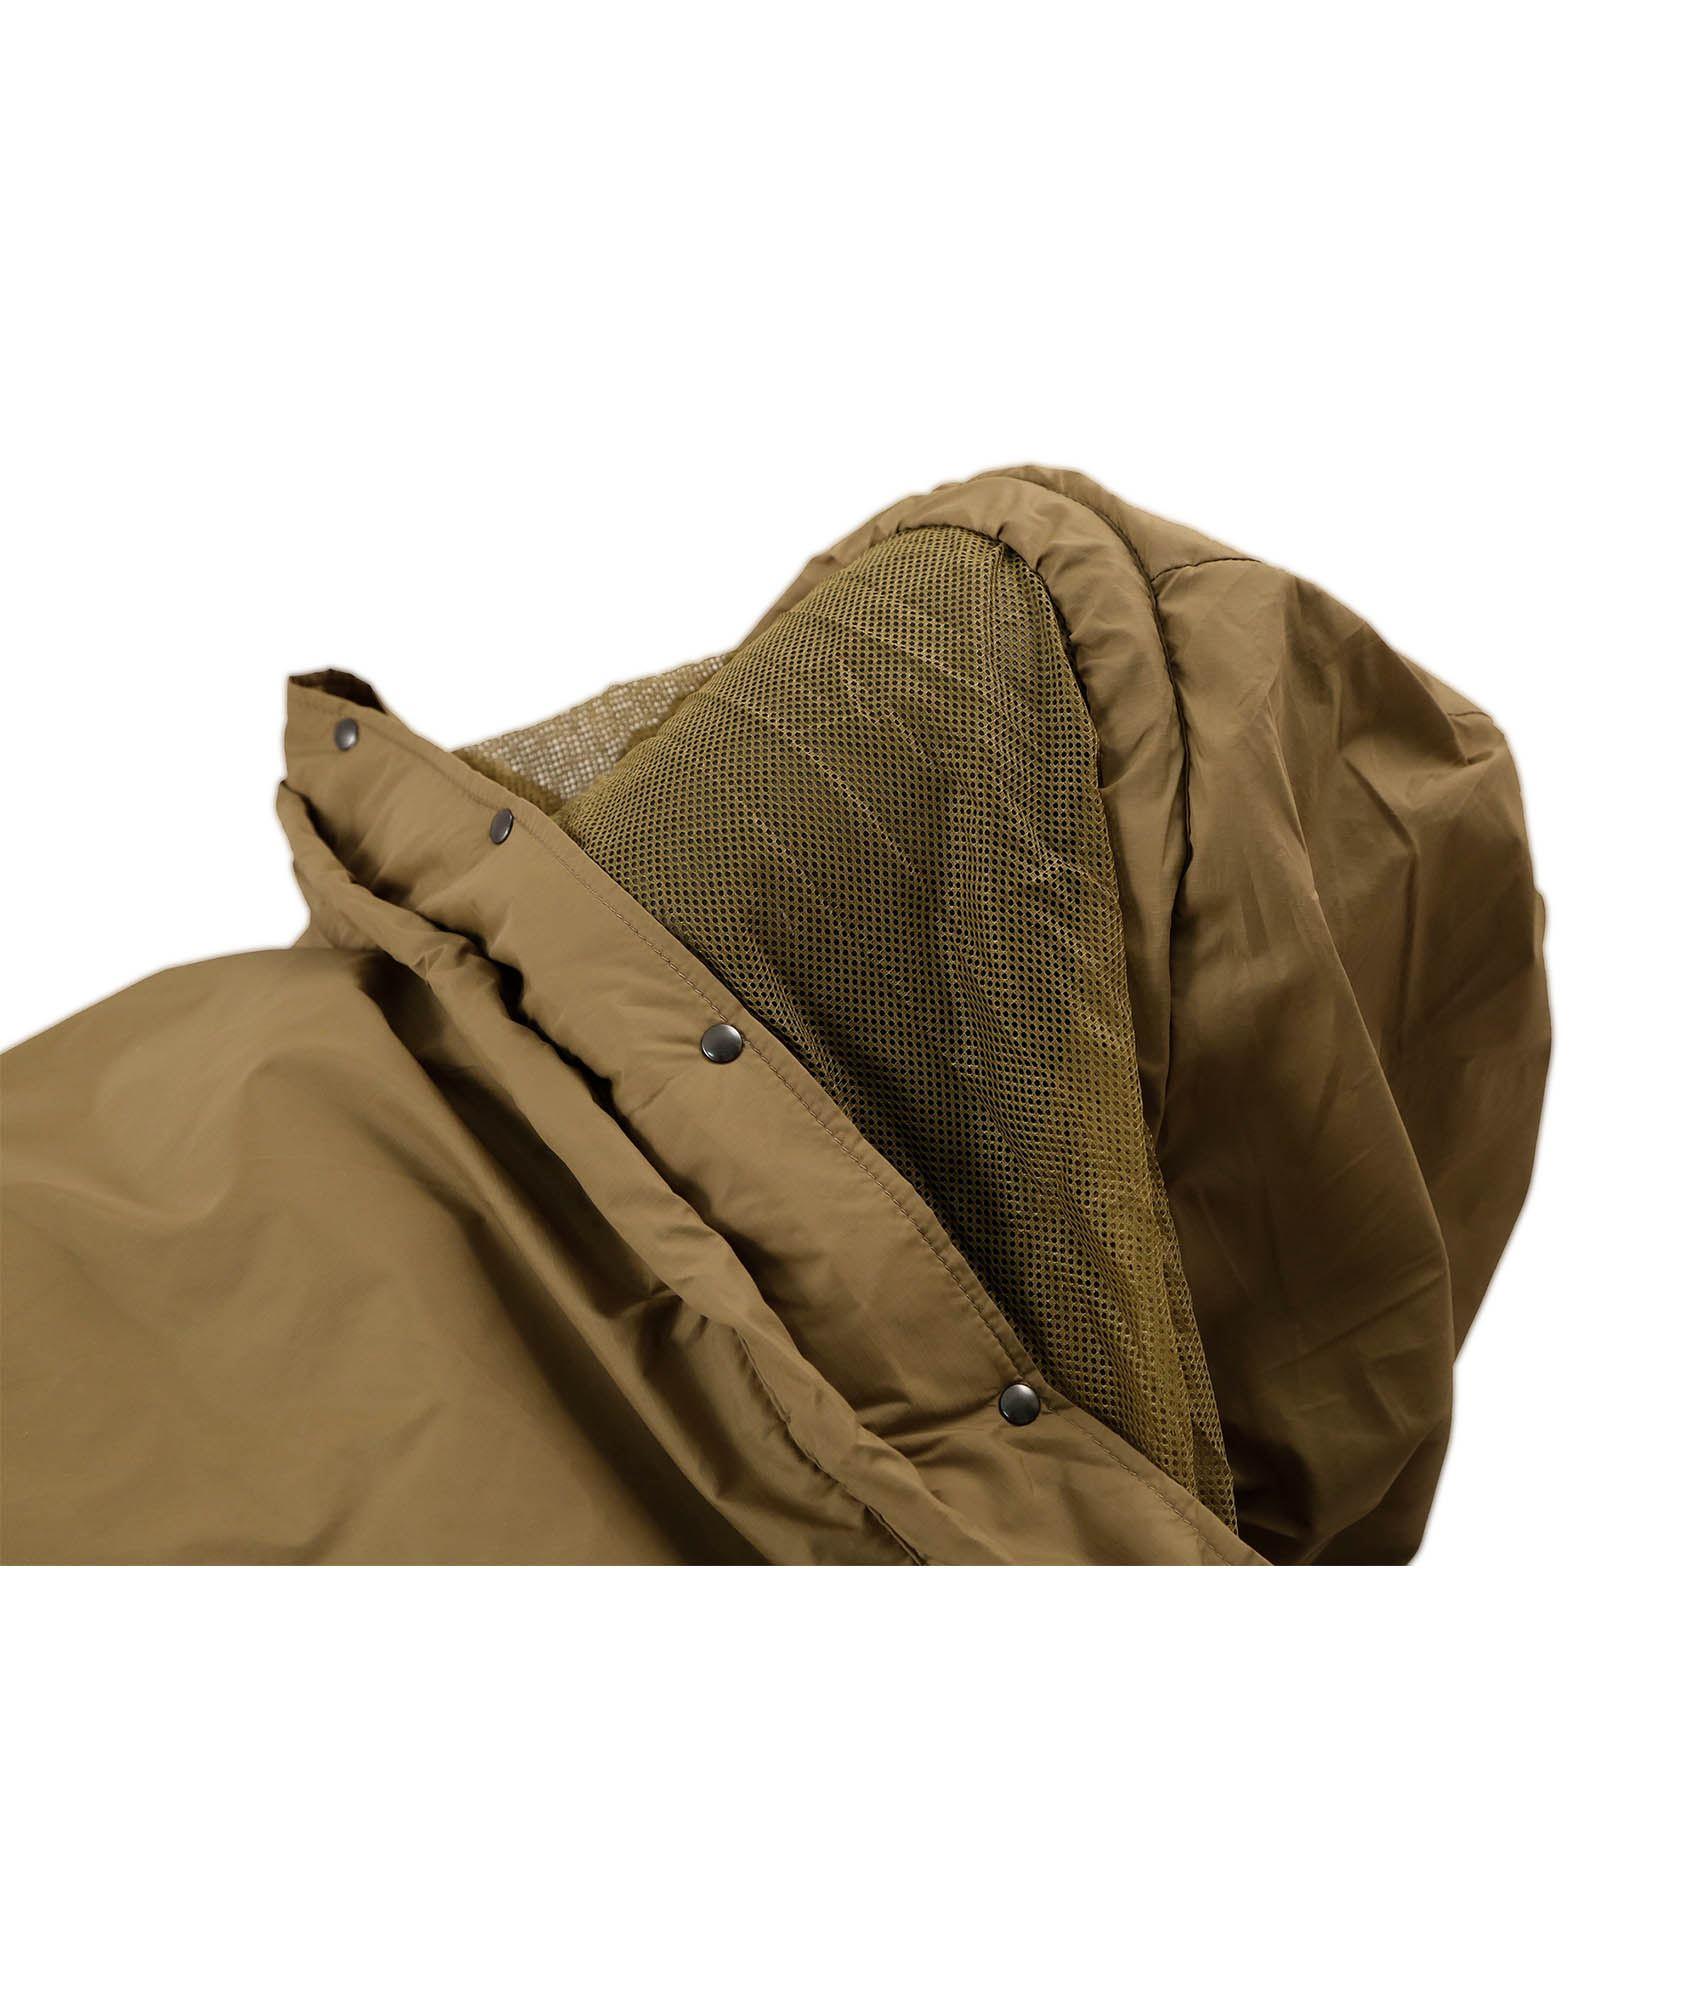 myggenet sovepose